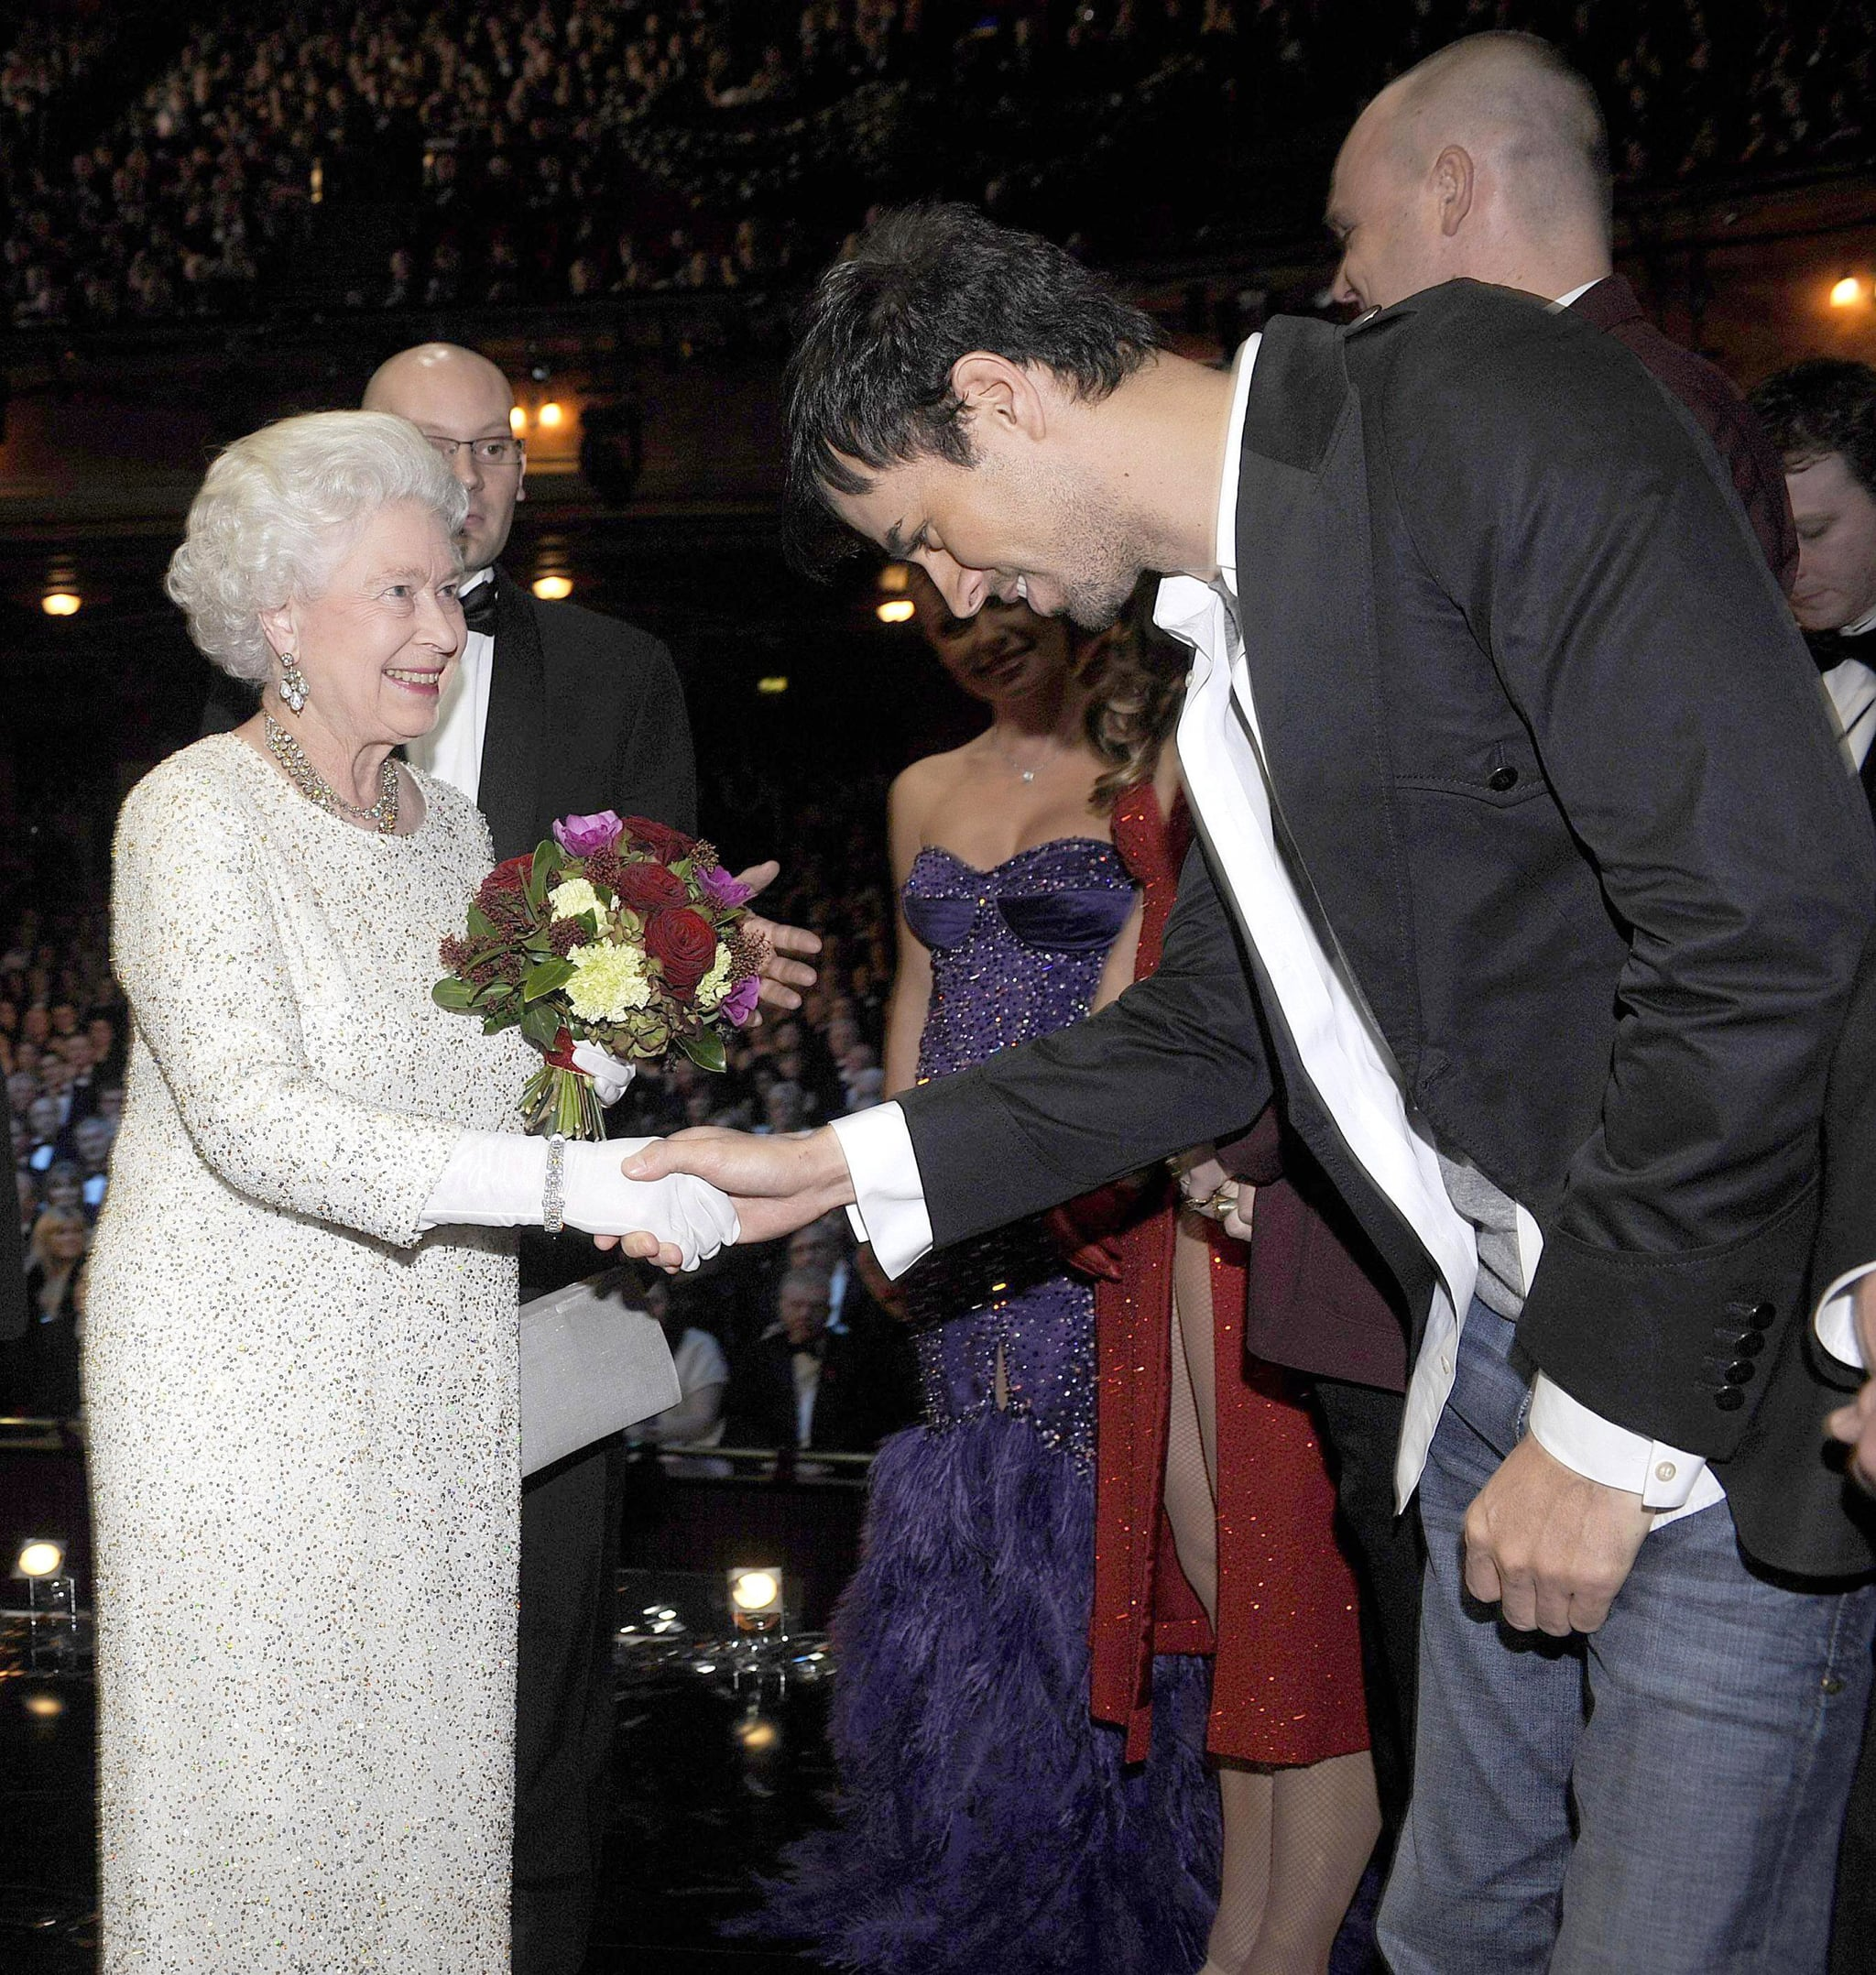 Enrique Iglesias met Queen Elizabeth at the Royal Variety Performance in Liverpool in December 2007.